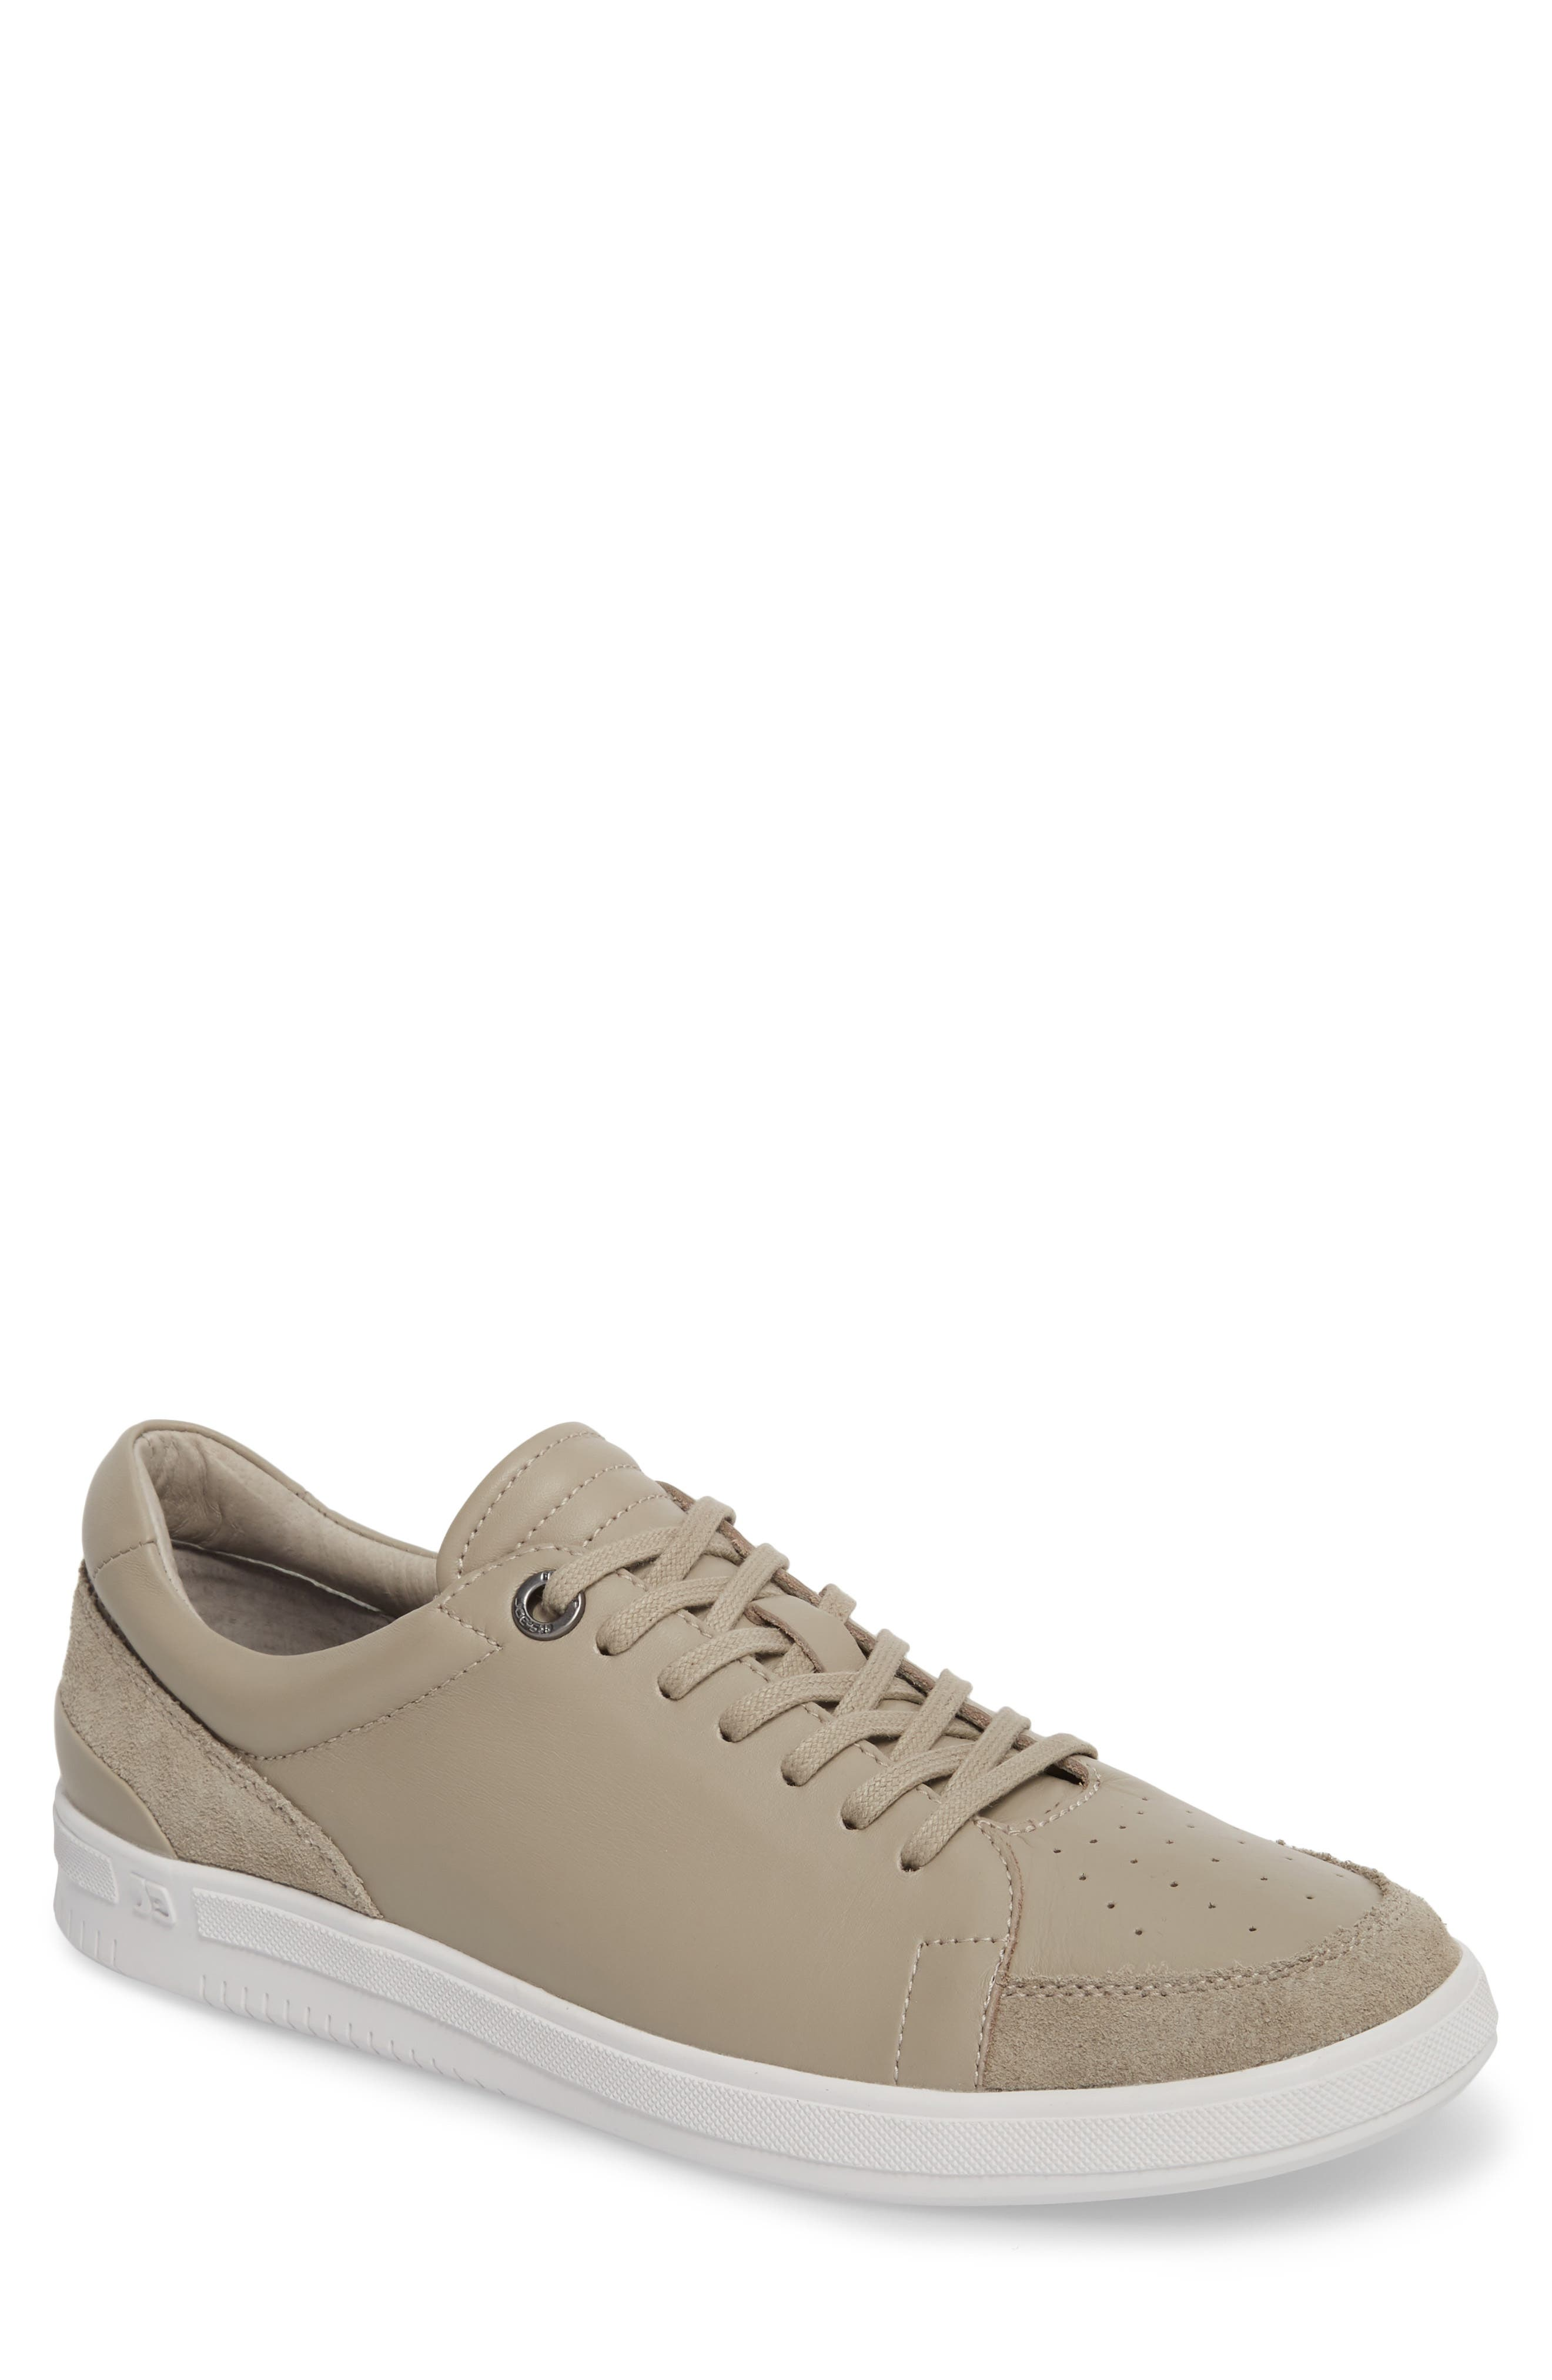 Joe Classic Low Top Sneaker,                             Main thumbnail 1, color,                             Stone Leather